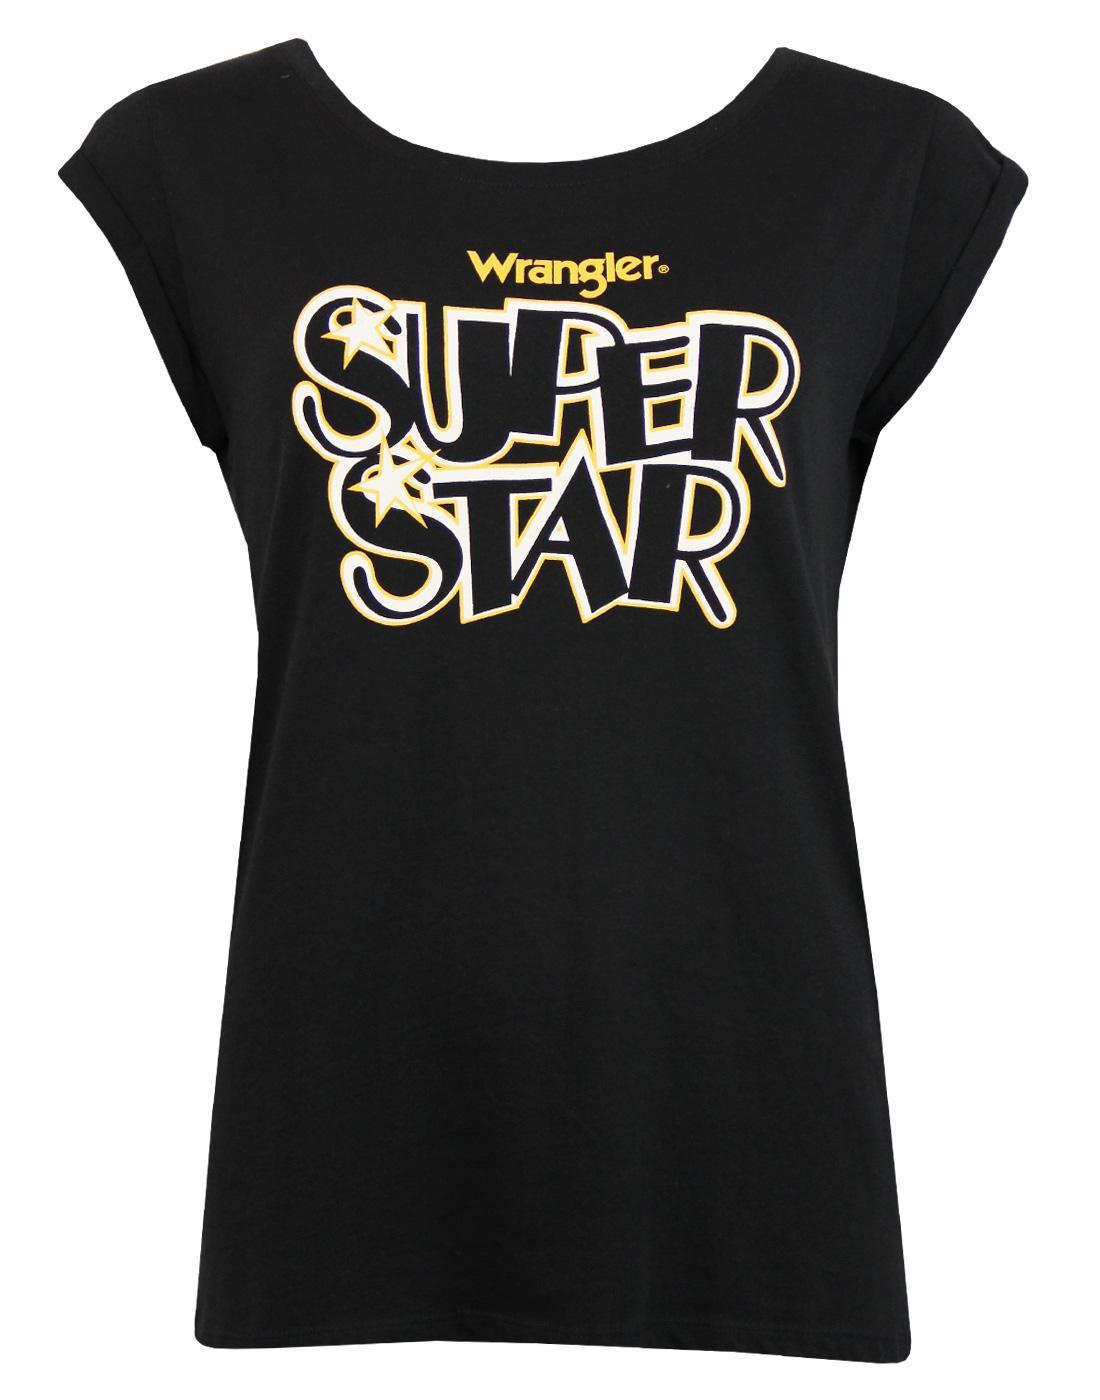 Super Star WRANGLER Retro 70s Cap Sleeve T-Shirt